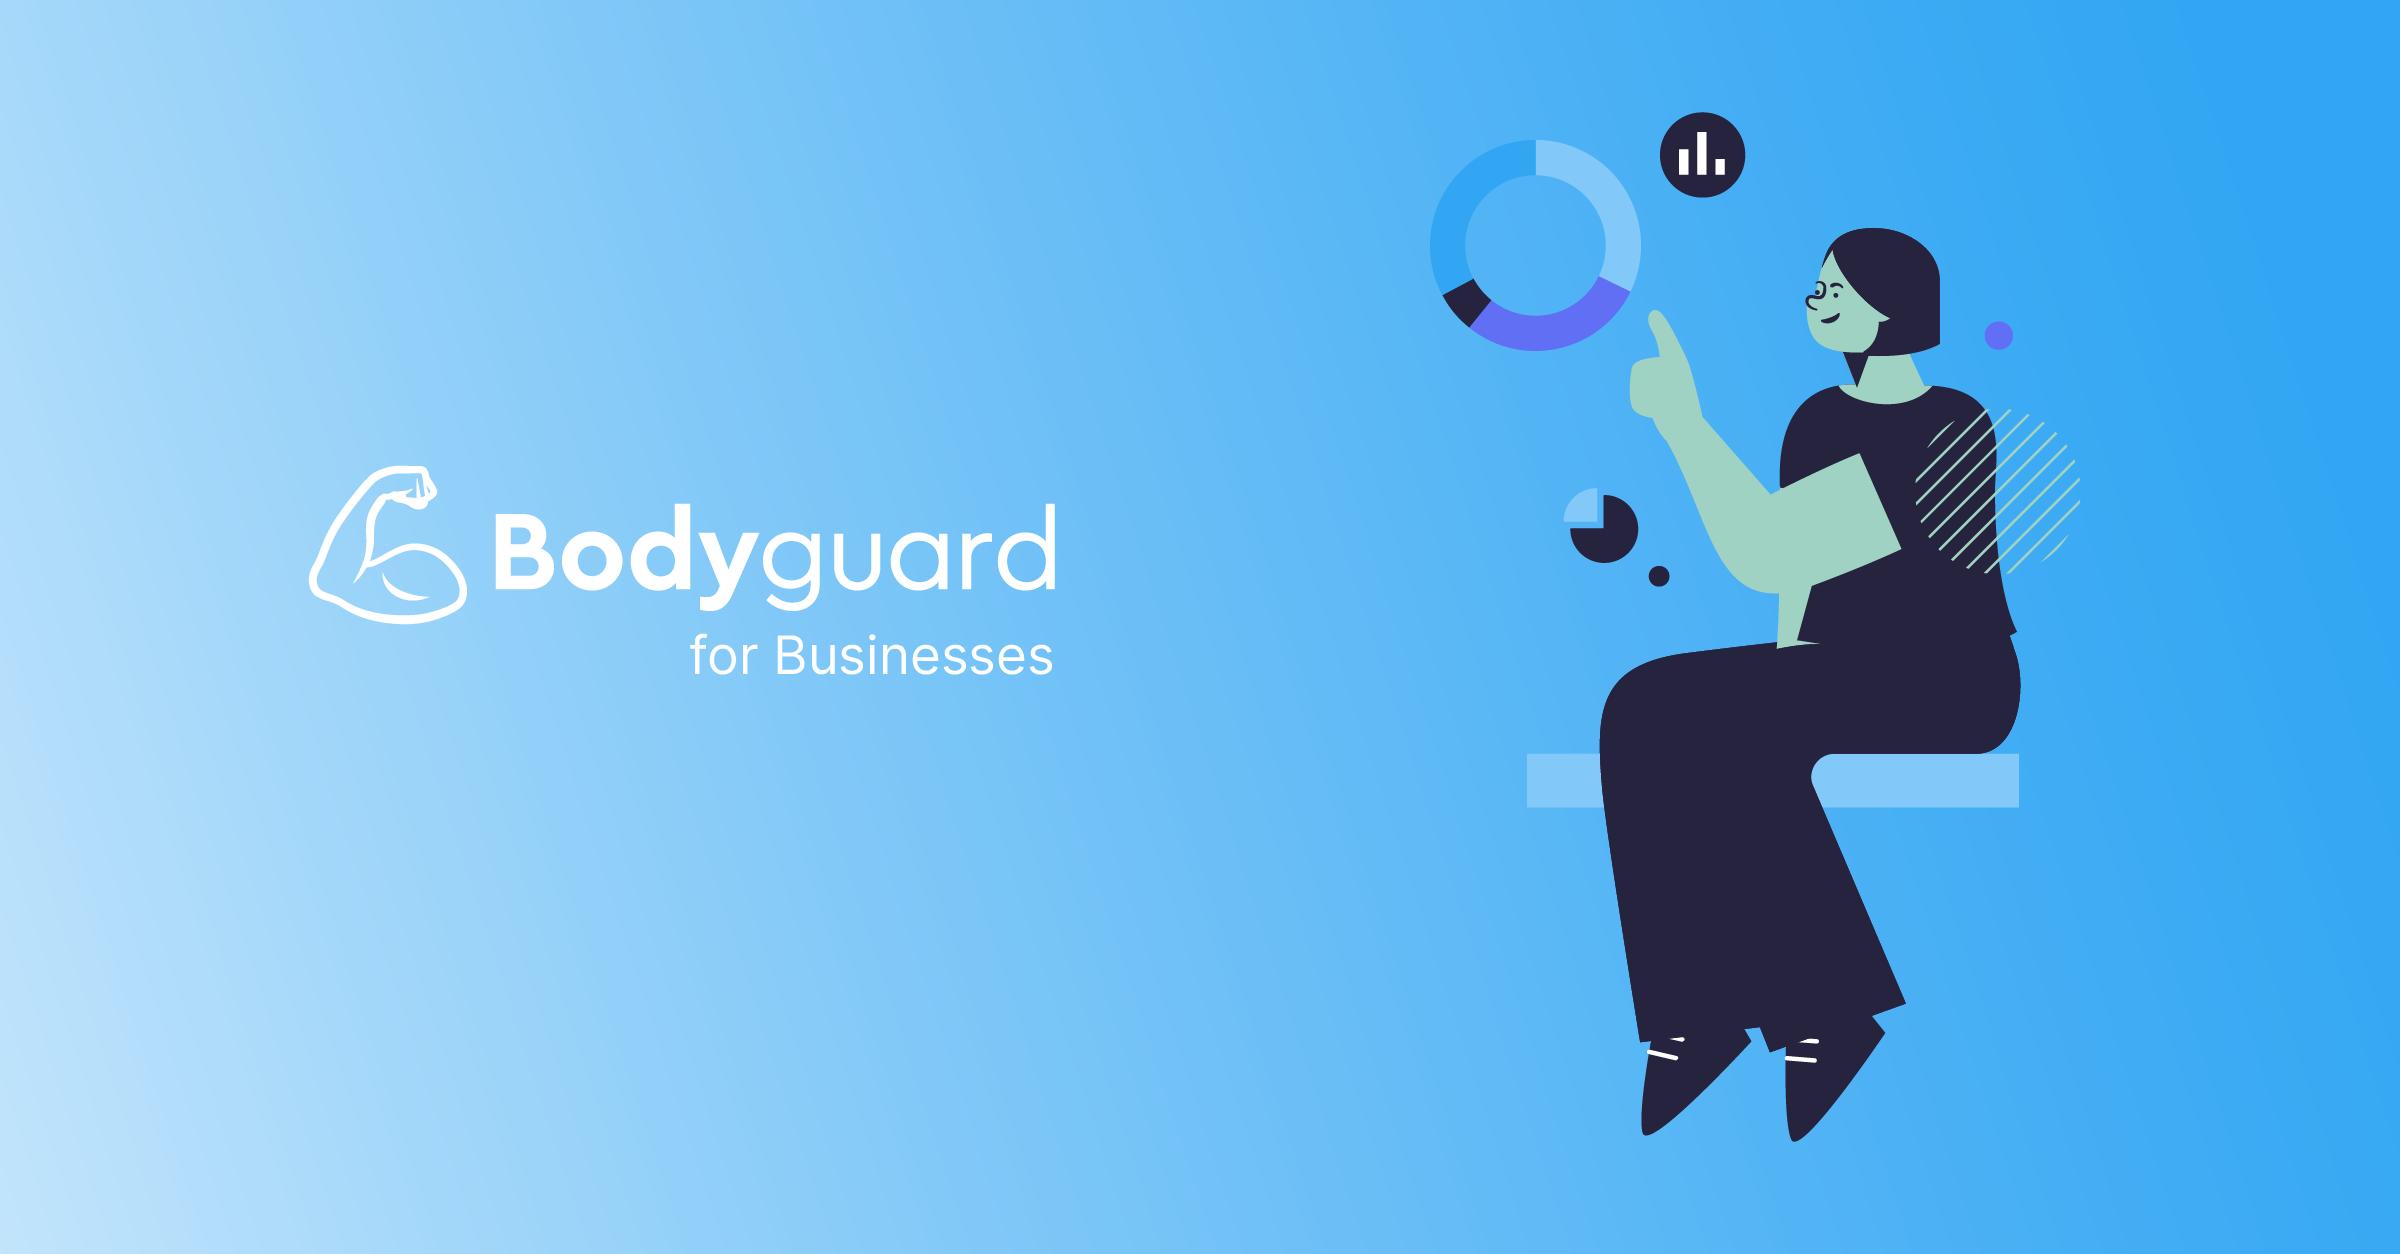 Bodyguard for Businesses